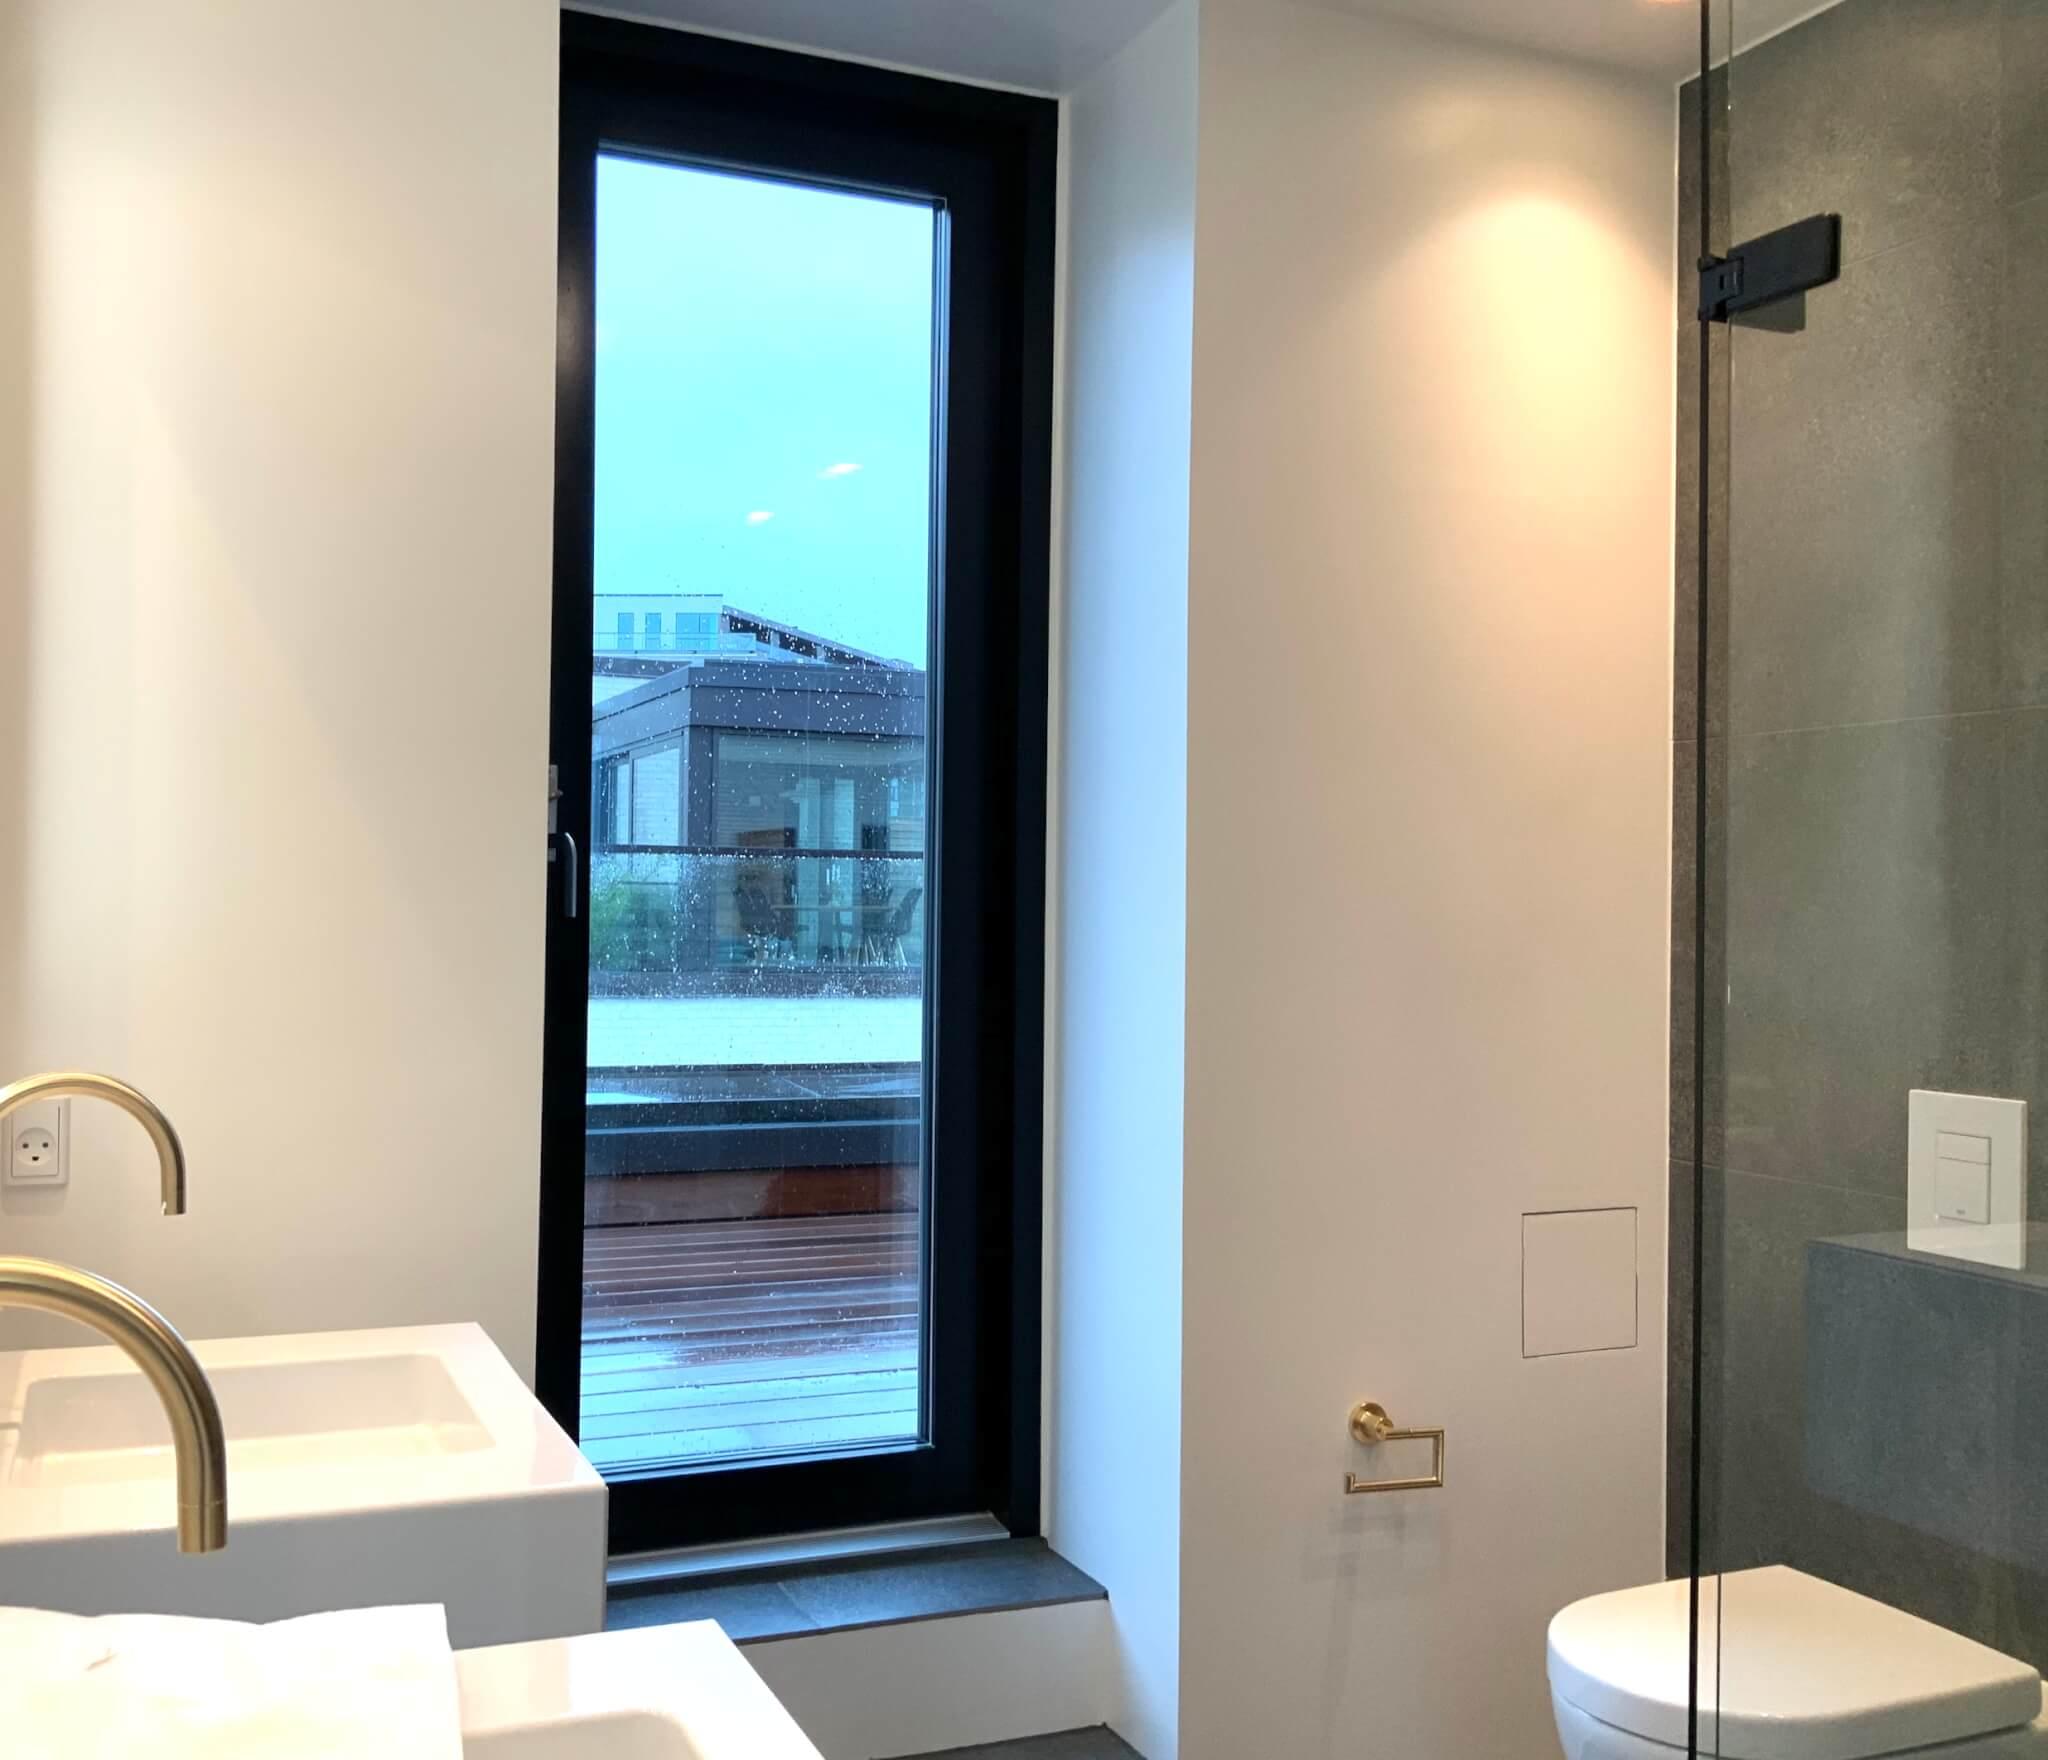 Badeværelse med italienske klinker